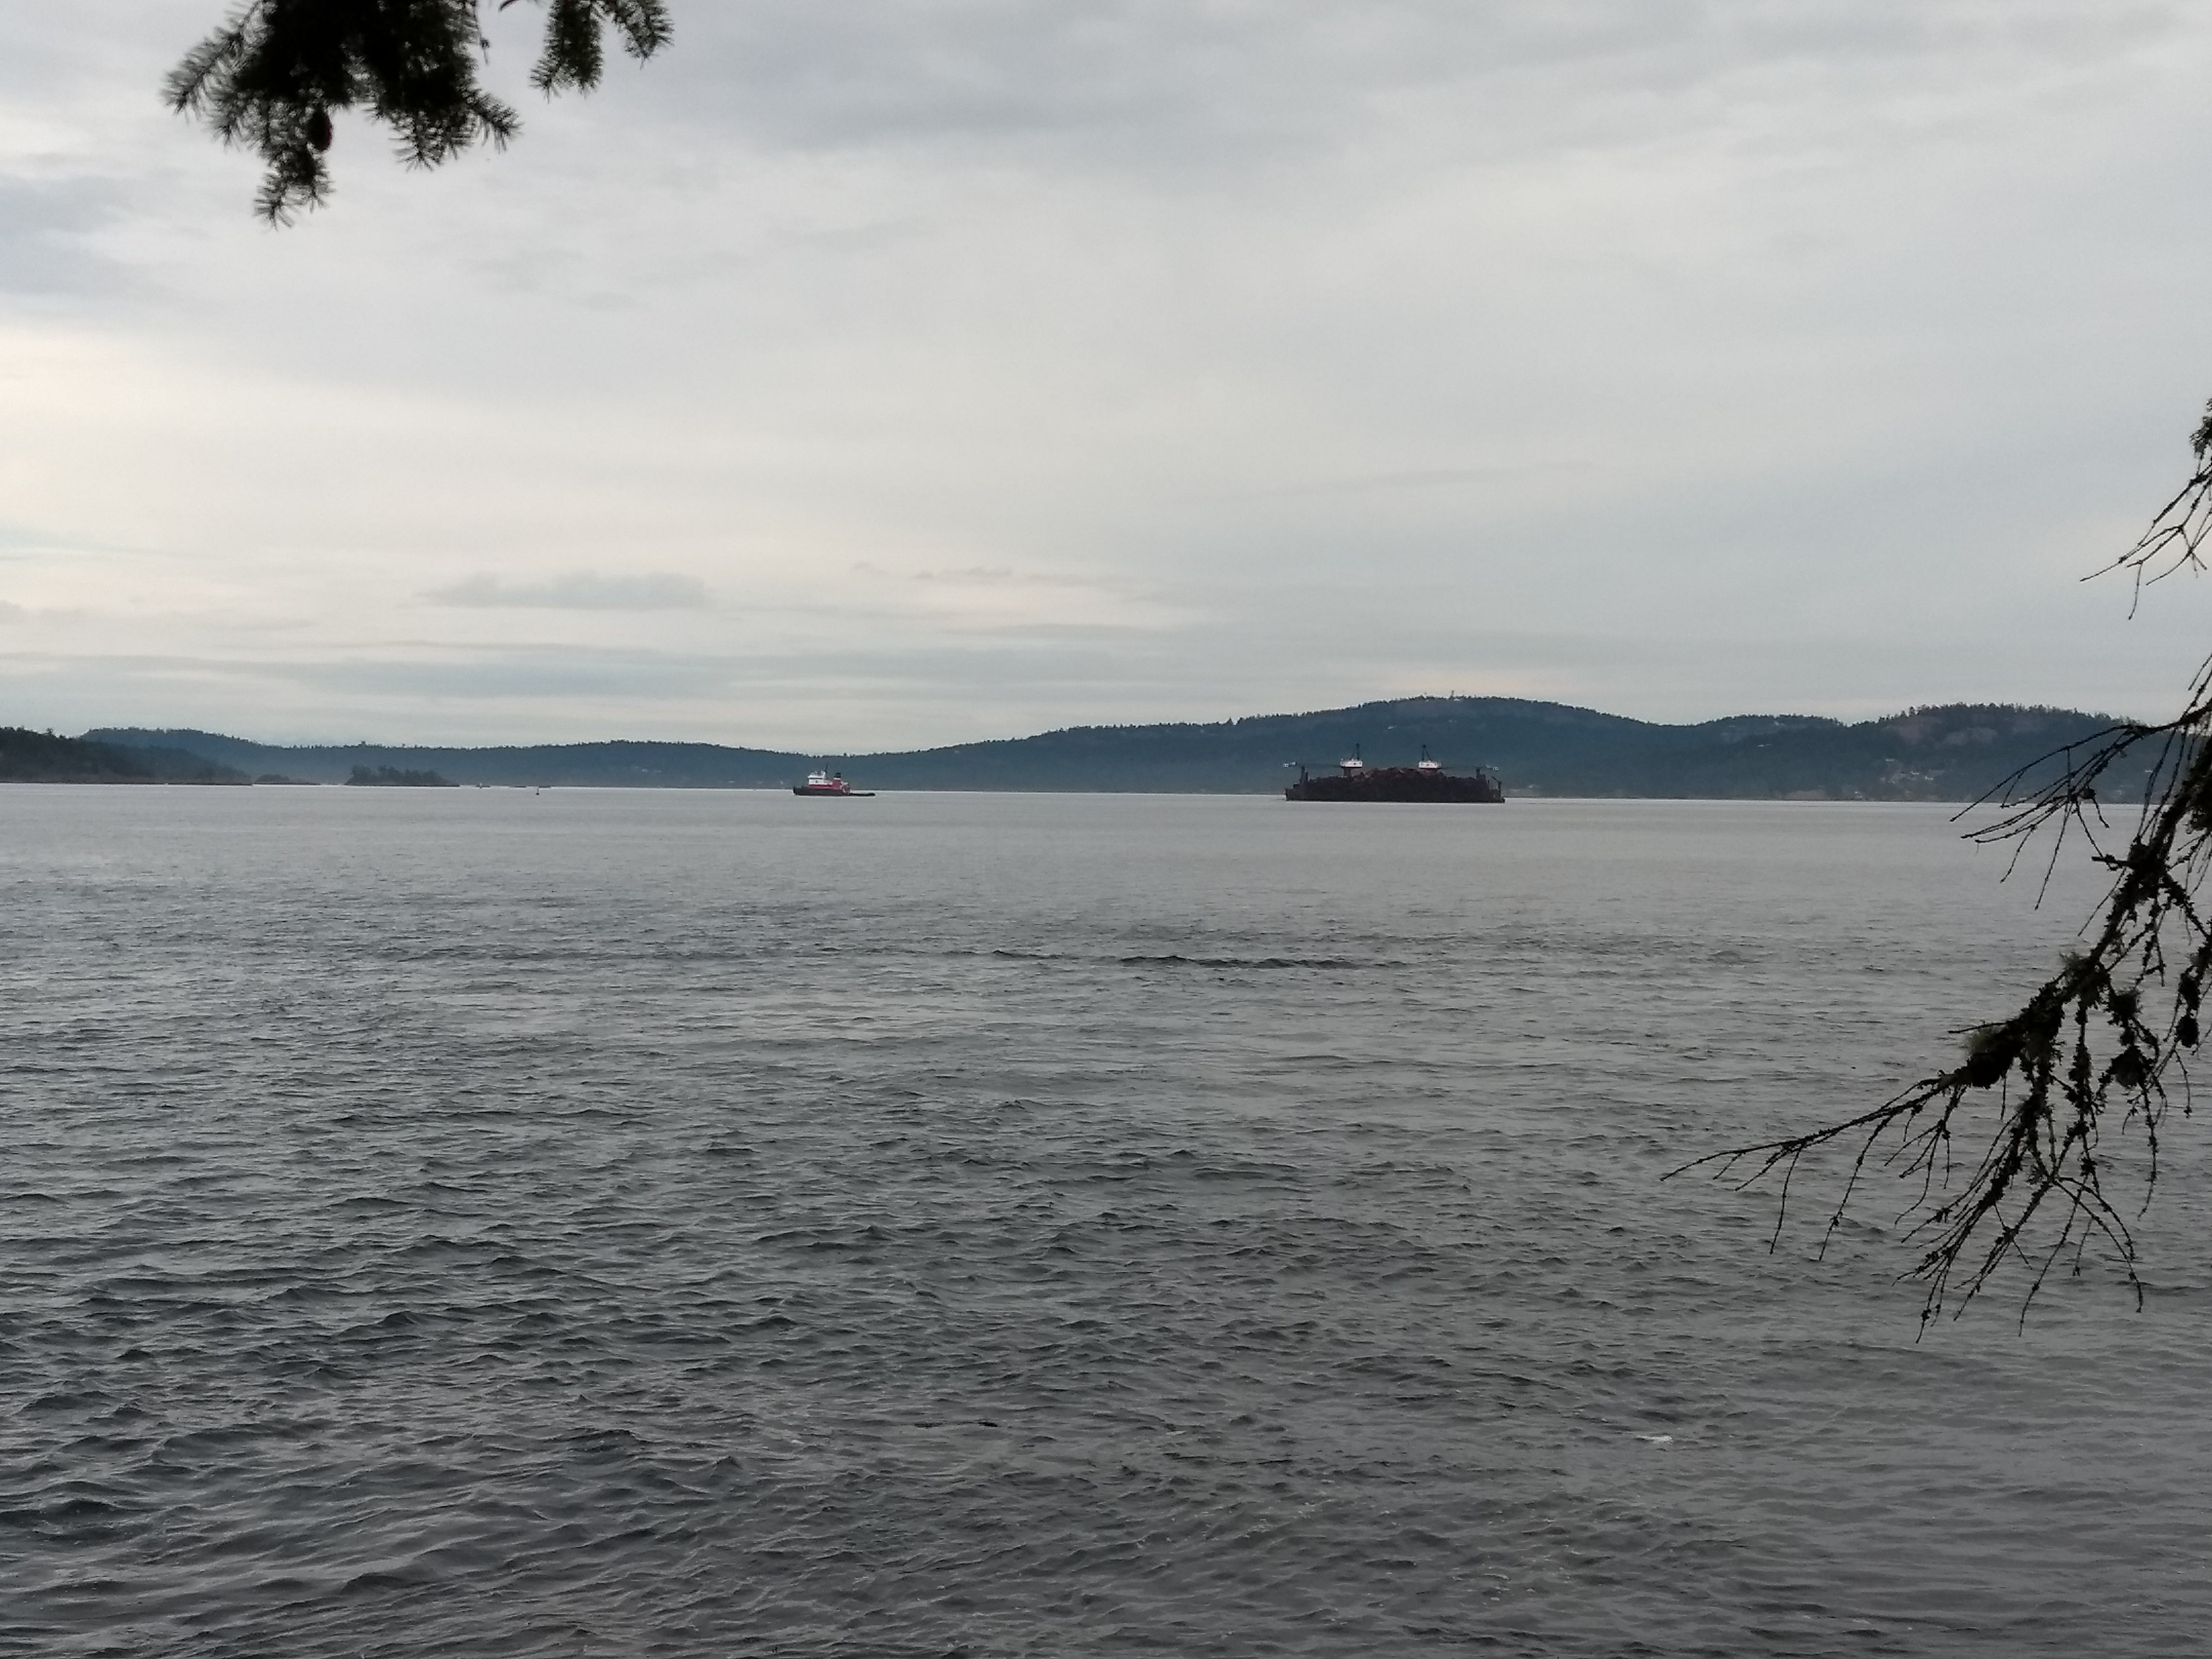 Tug & Barge View